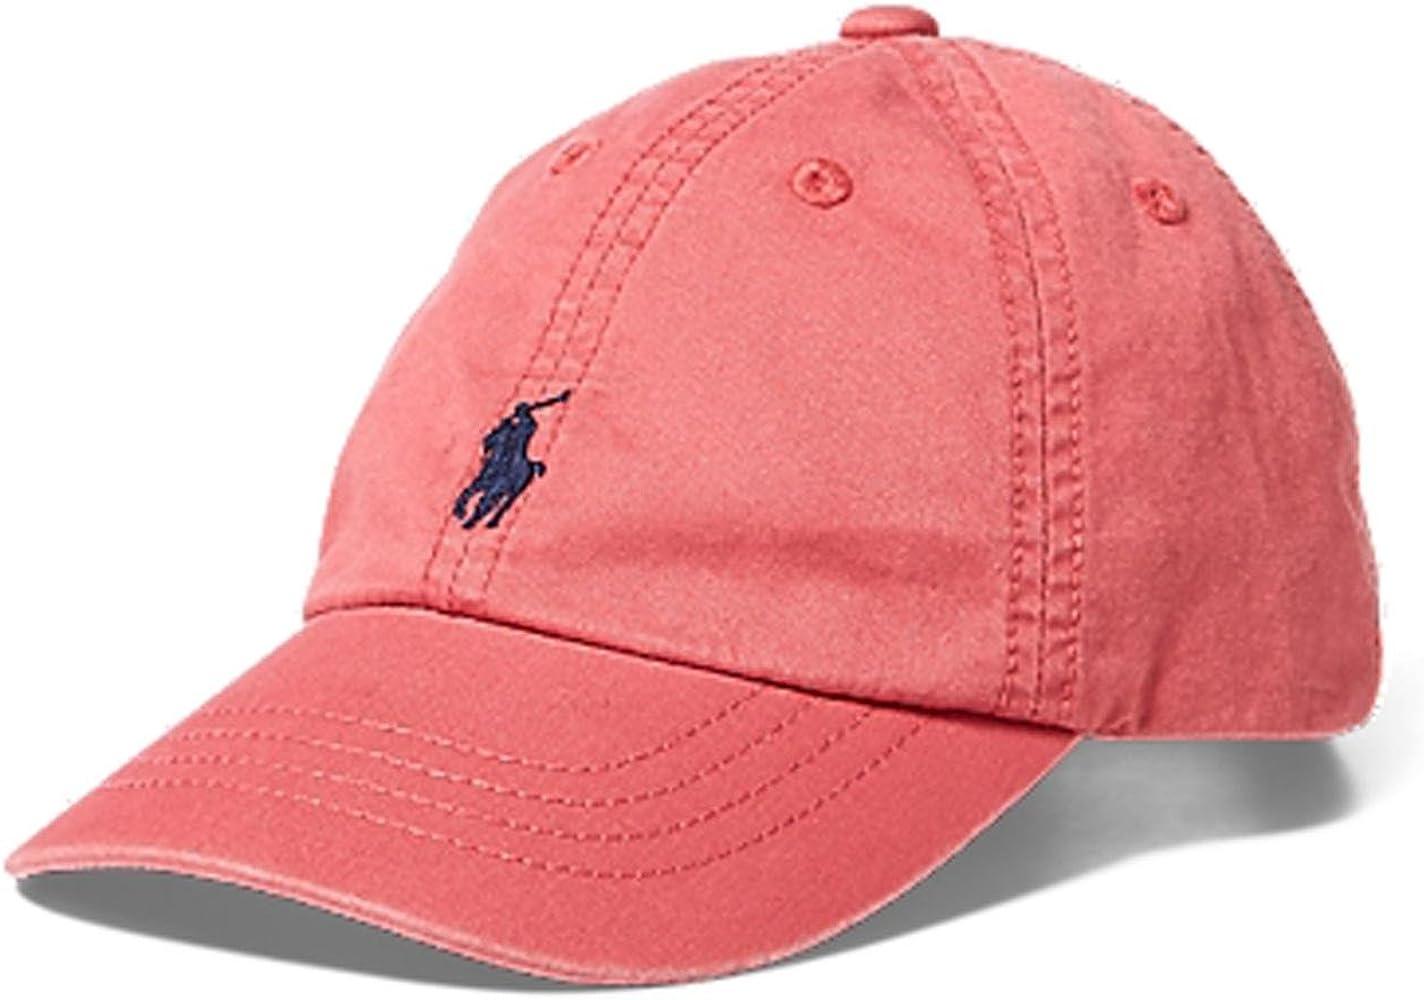 Ralph Lauren Gorra Hombre Polo Sport Pink: Amazon.es: Ropa y ...